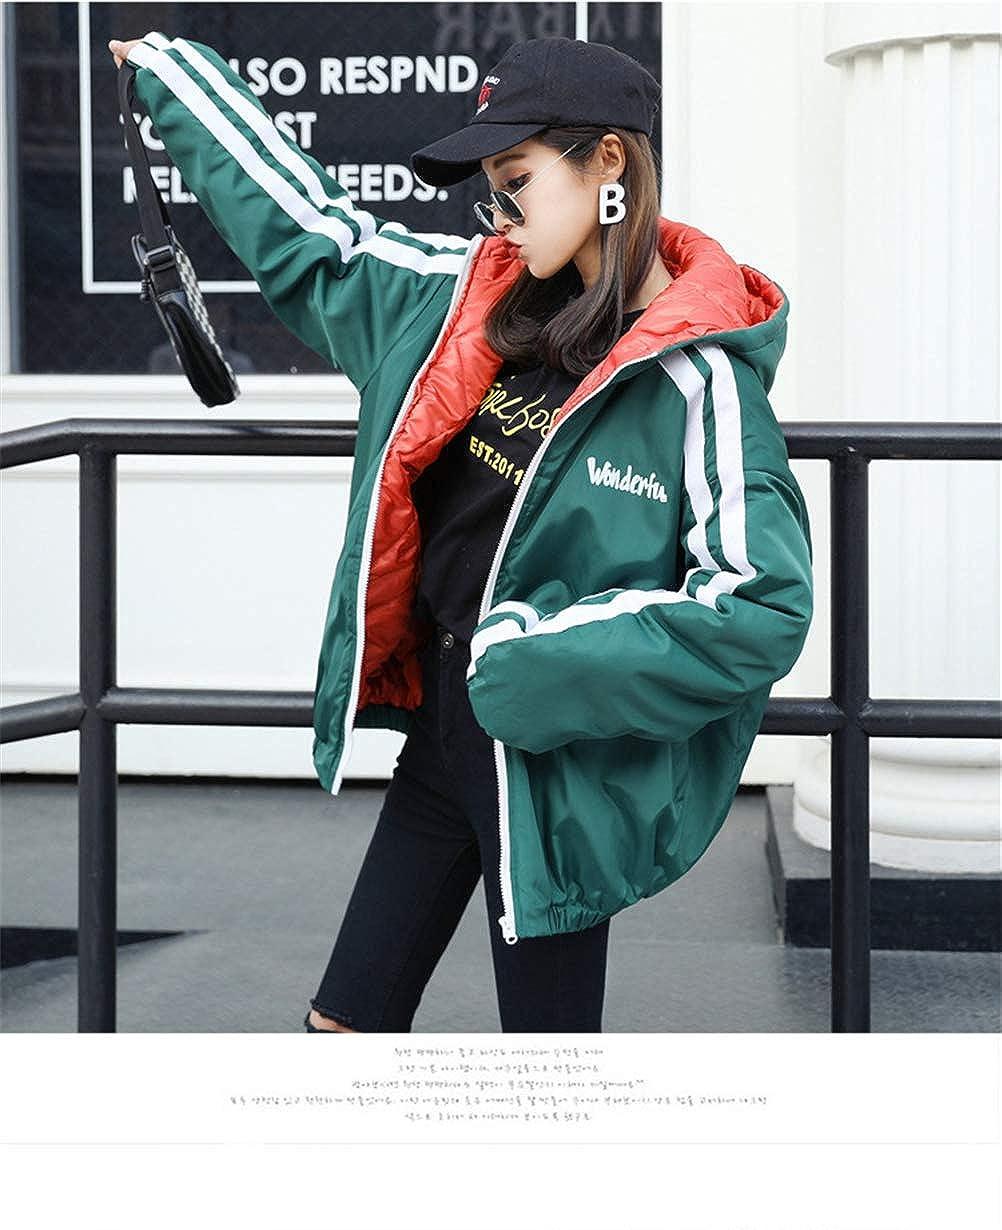 Qikaka Womens Fashion Winter Warm Hoodie Ribbon Back Patch Casual BF Style Thicken Cotton Coat Jacket Outwear